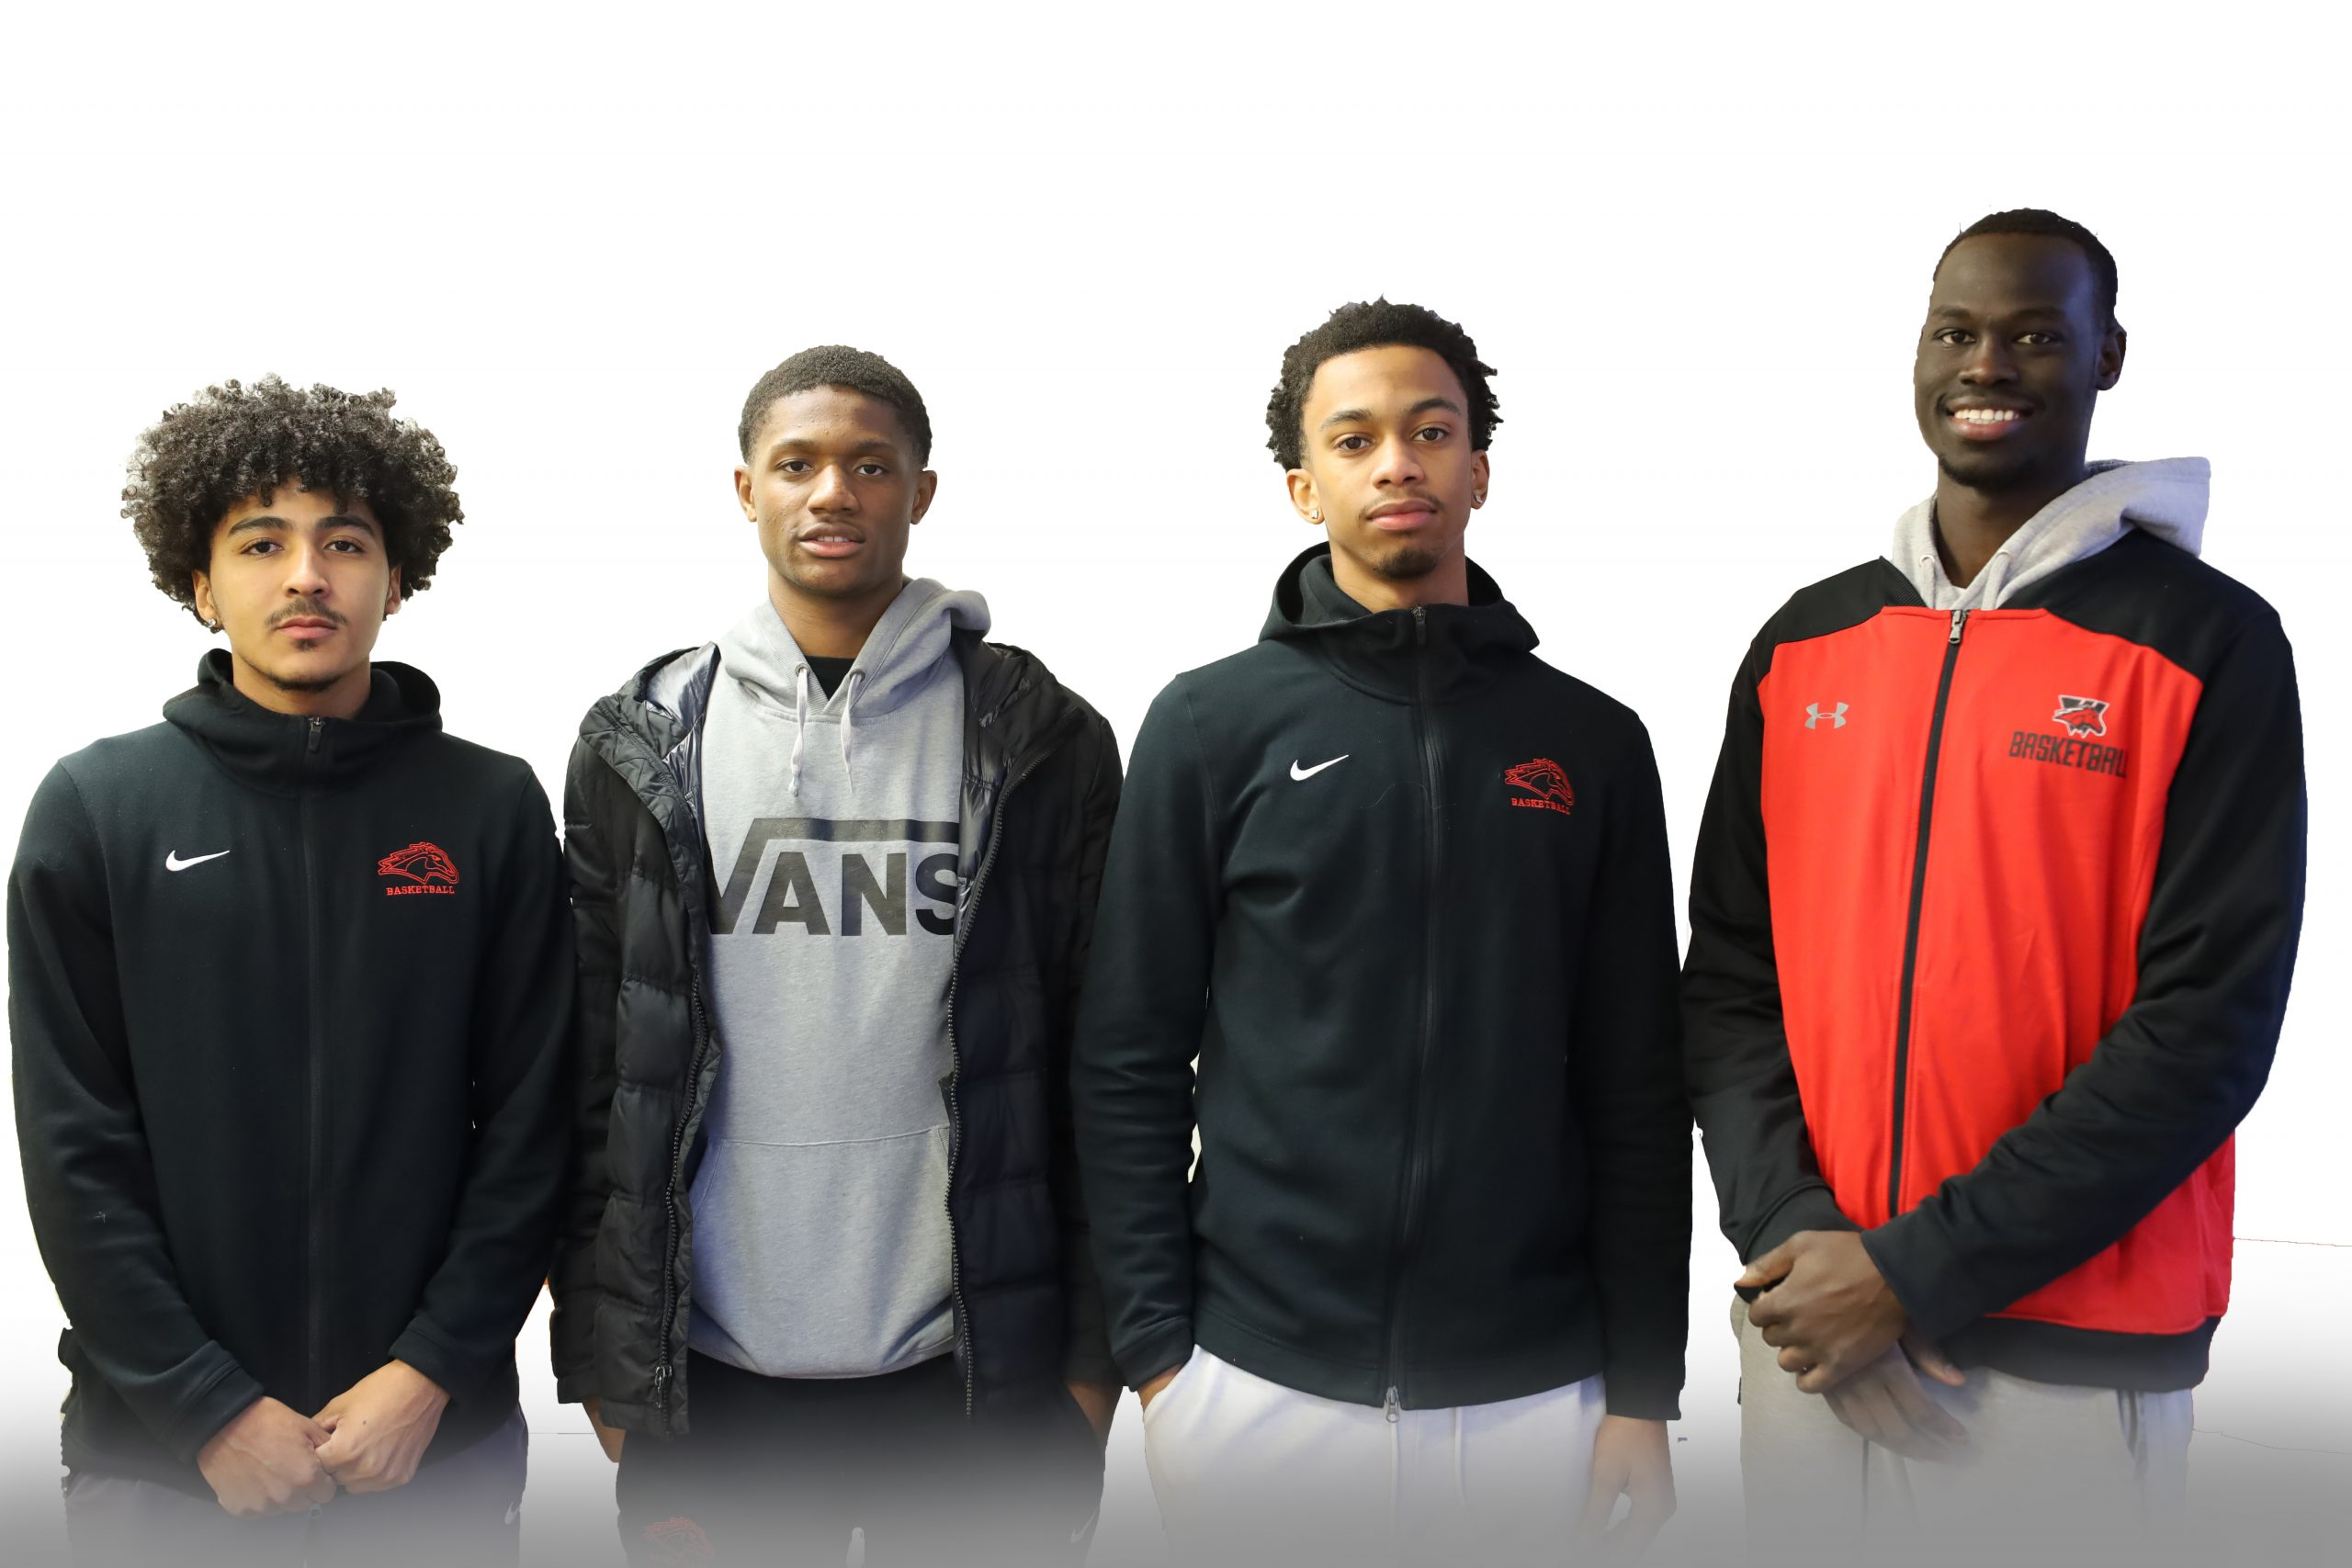 Sacrifice — WWCC Men's Basketball Team (Ep. 10)